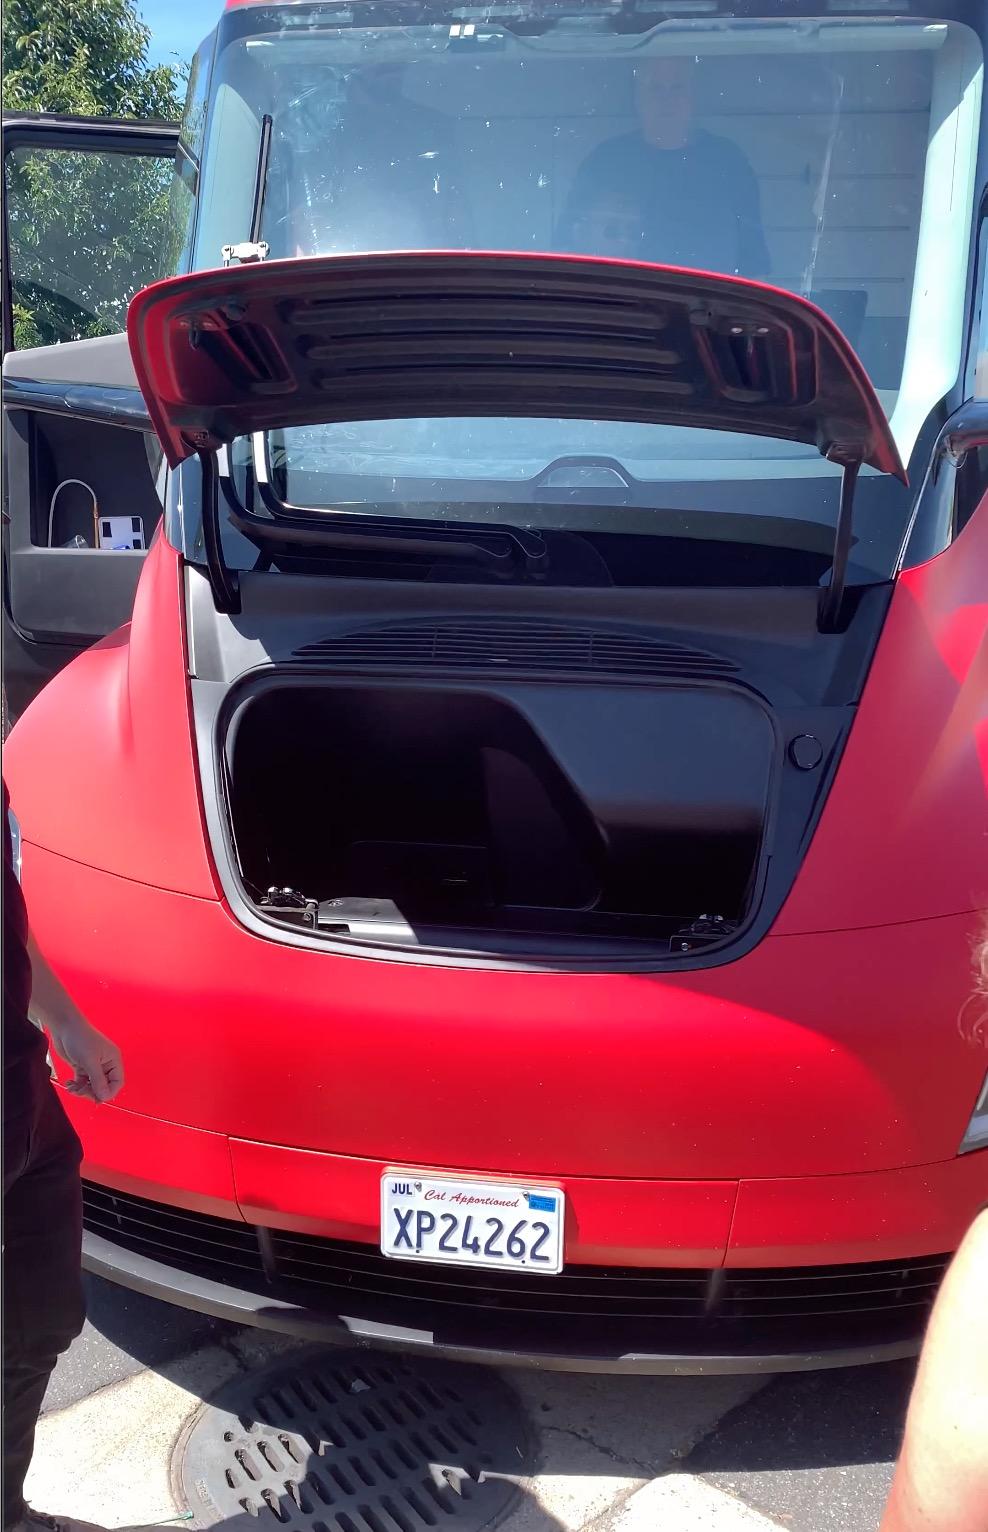 Tesla Semi Prototype spotted, first look at the frunk - Electrek